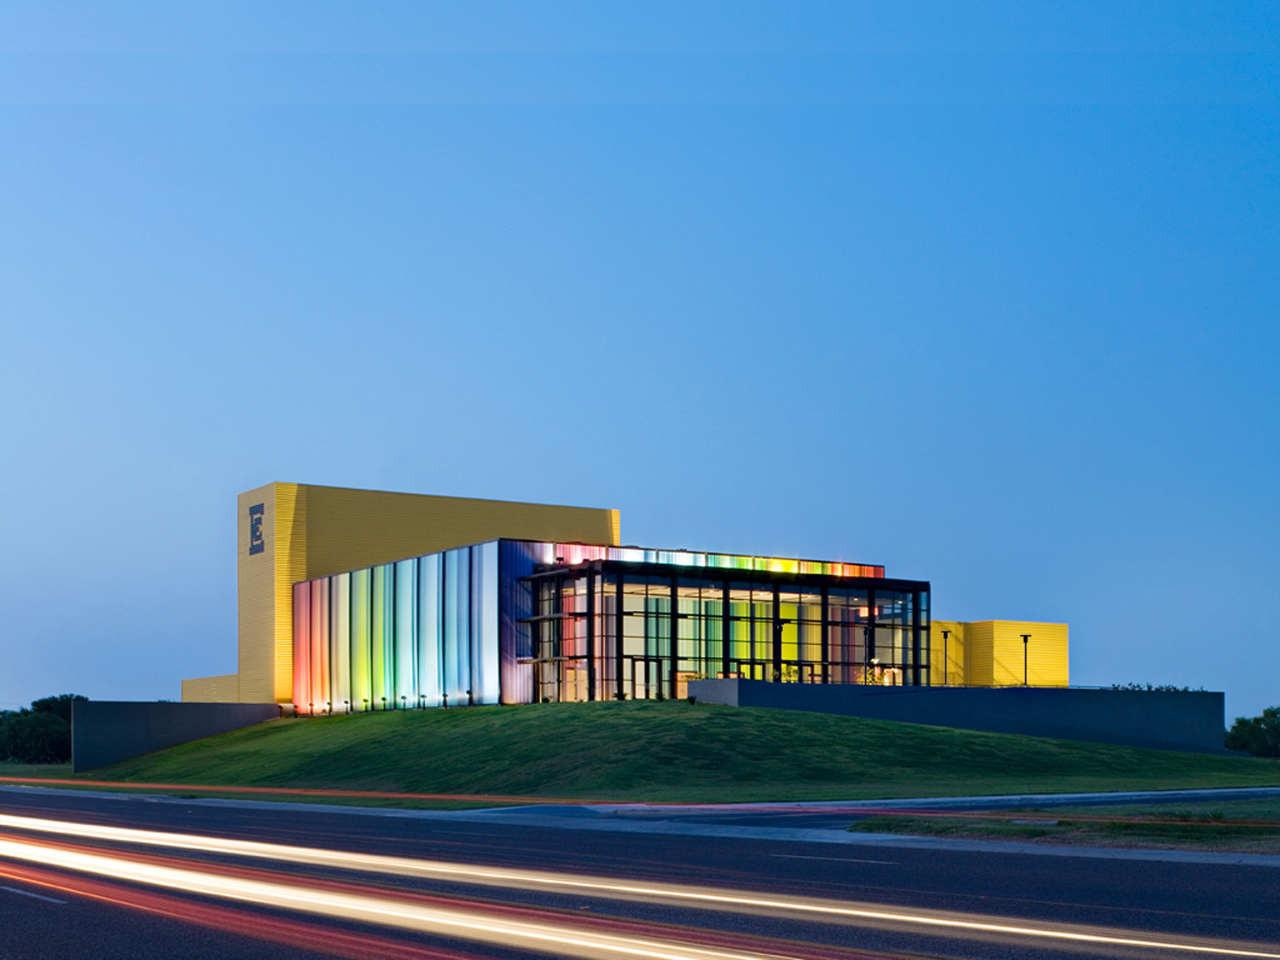 Edcouch-Elsa ISD Fine Arts Center / Kell Muñoz Architects, © Chris Cooper Photography